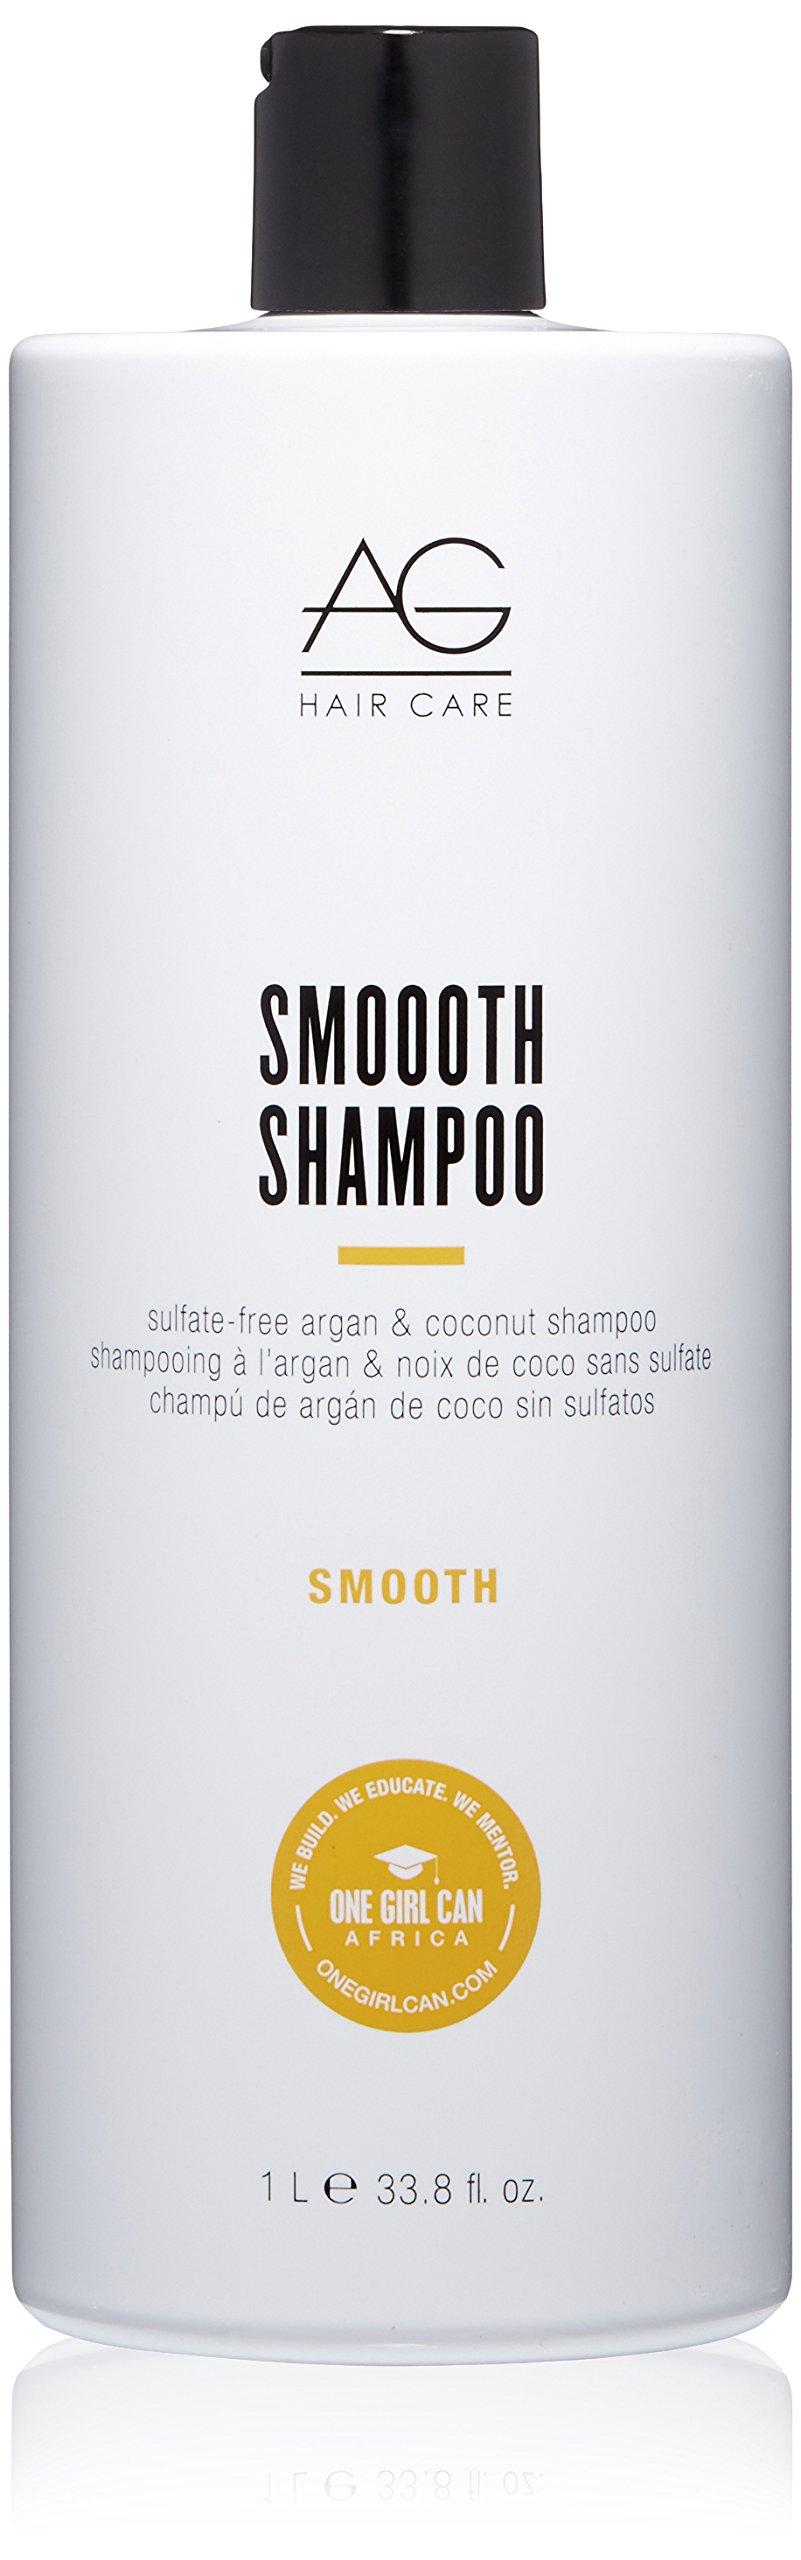 AG Hair Smoooth Sulfate-Free Argan & Coconut Shampoo by AG